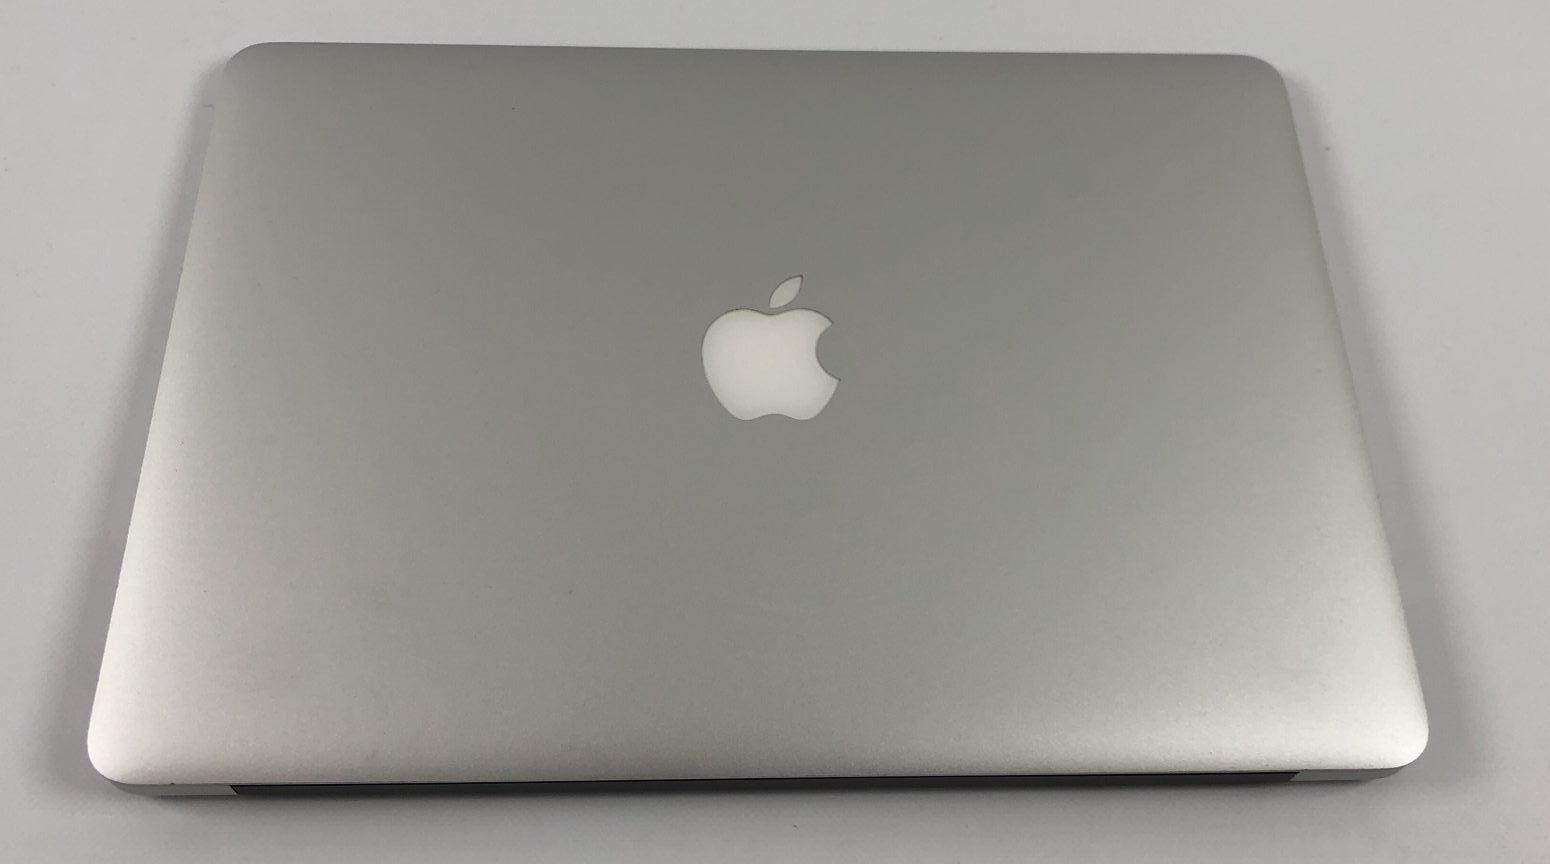 "MacBook Air 13"" Early 2015 (Intel Core i5 1.6 GHz 8 GB RAM 256 GB SSD), Intel Core i5 1.6 GHz, 8 GB RAM, 256 GB SSD, image 2"